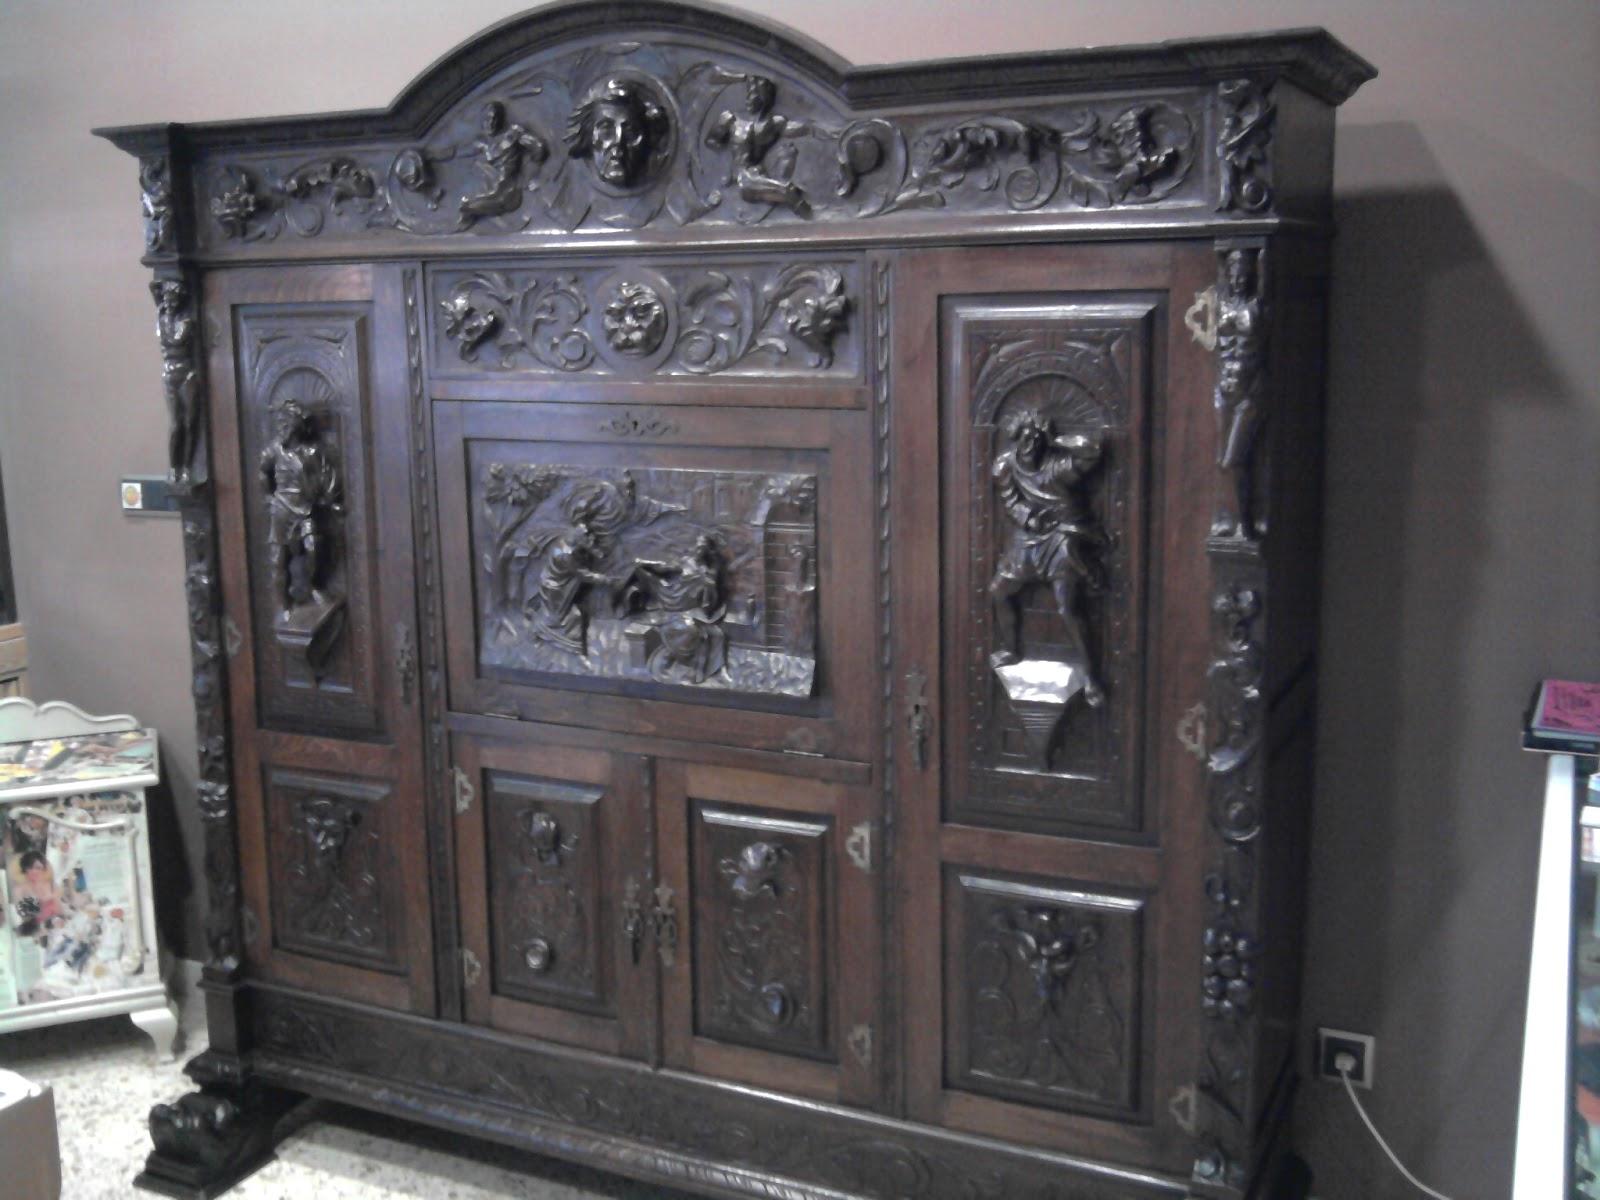 La casa retroencantada mueble de estilo espa ol siglo xix for Mueble castellano restaurado